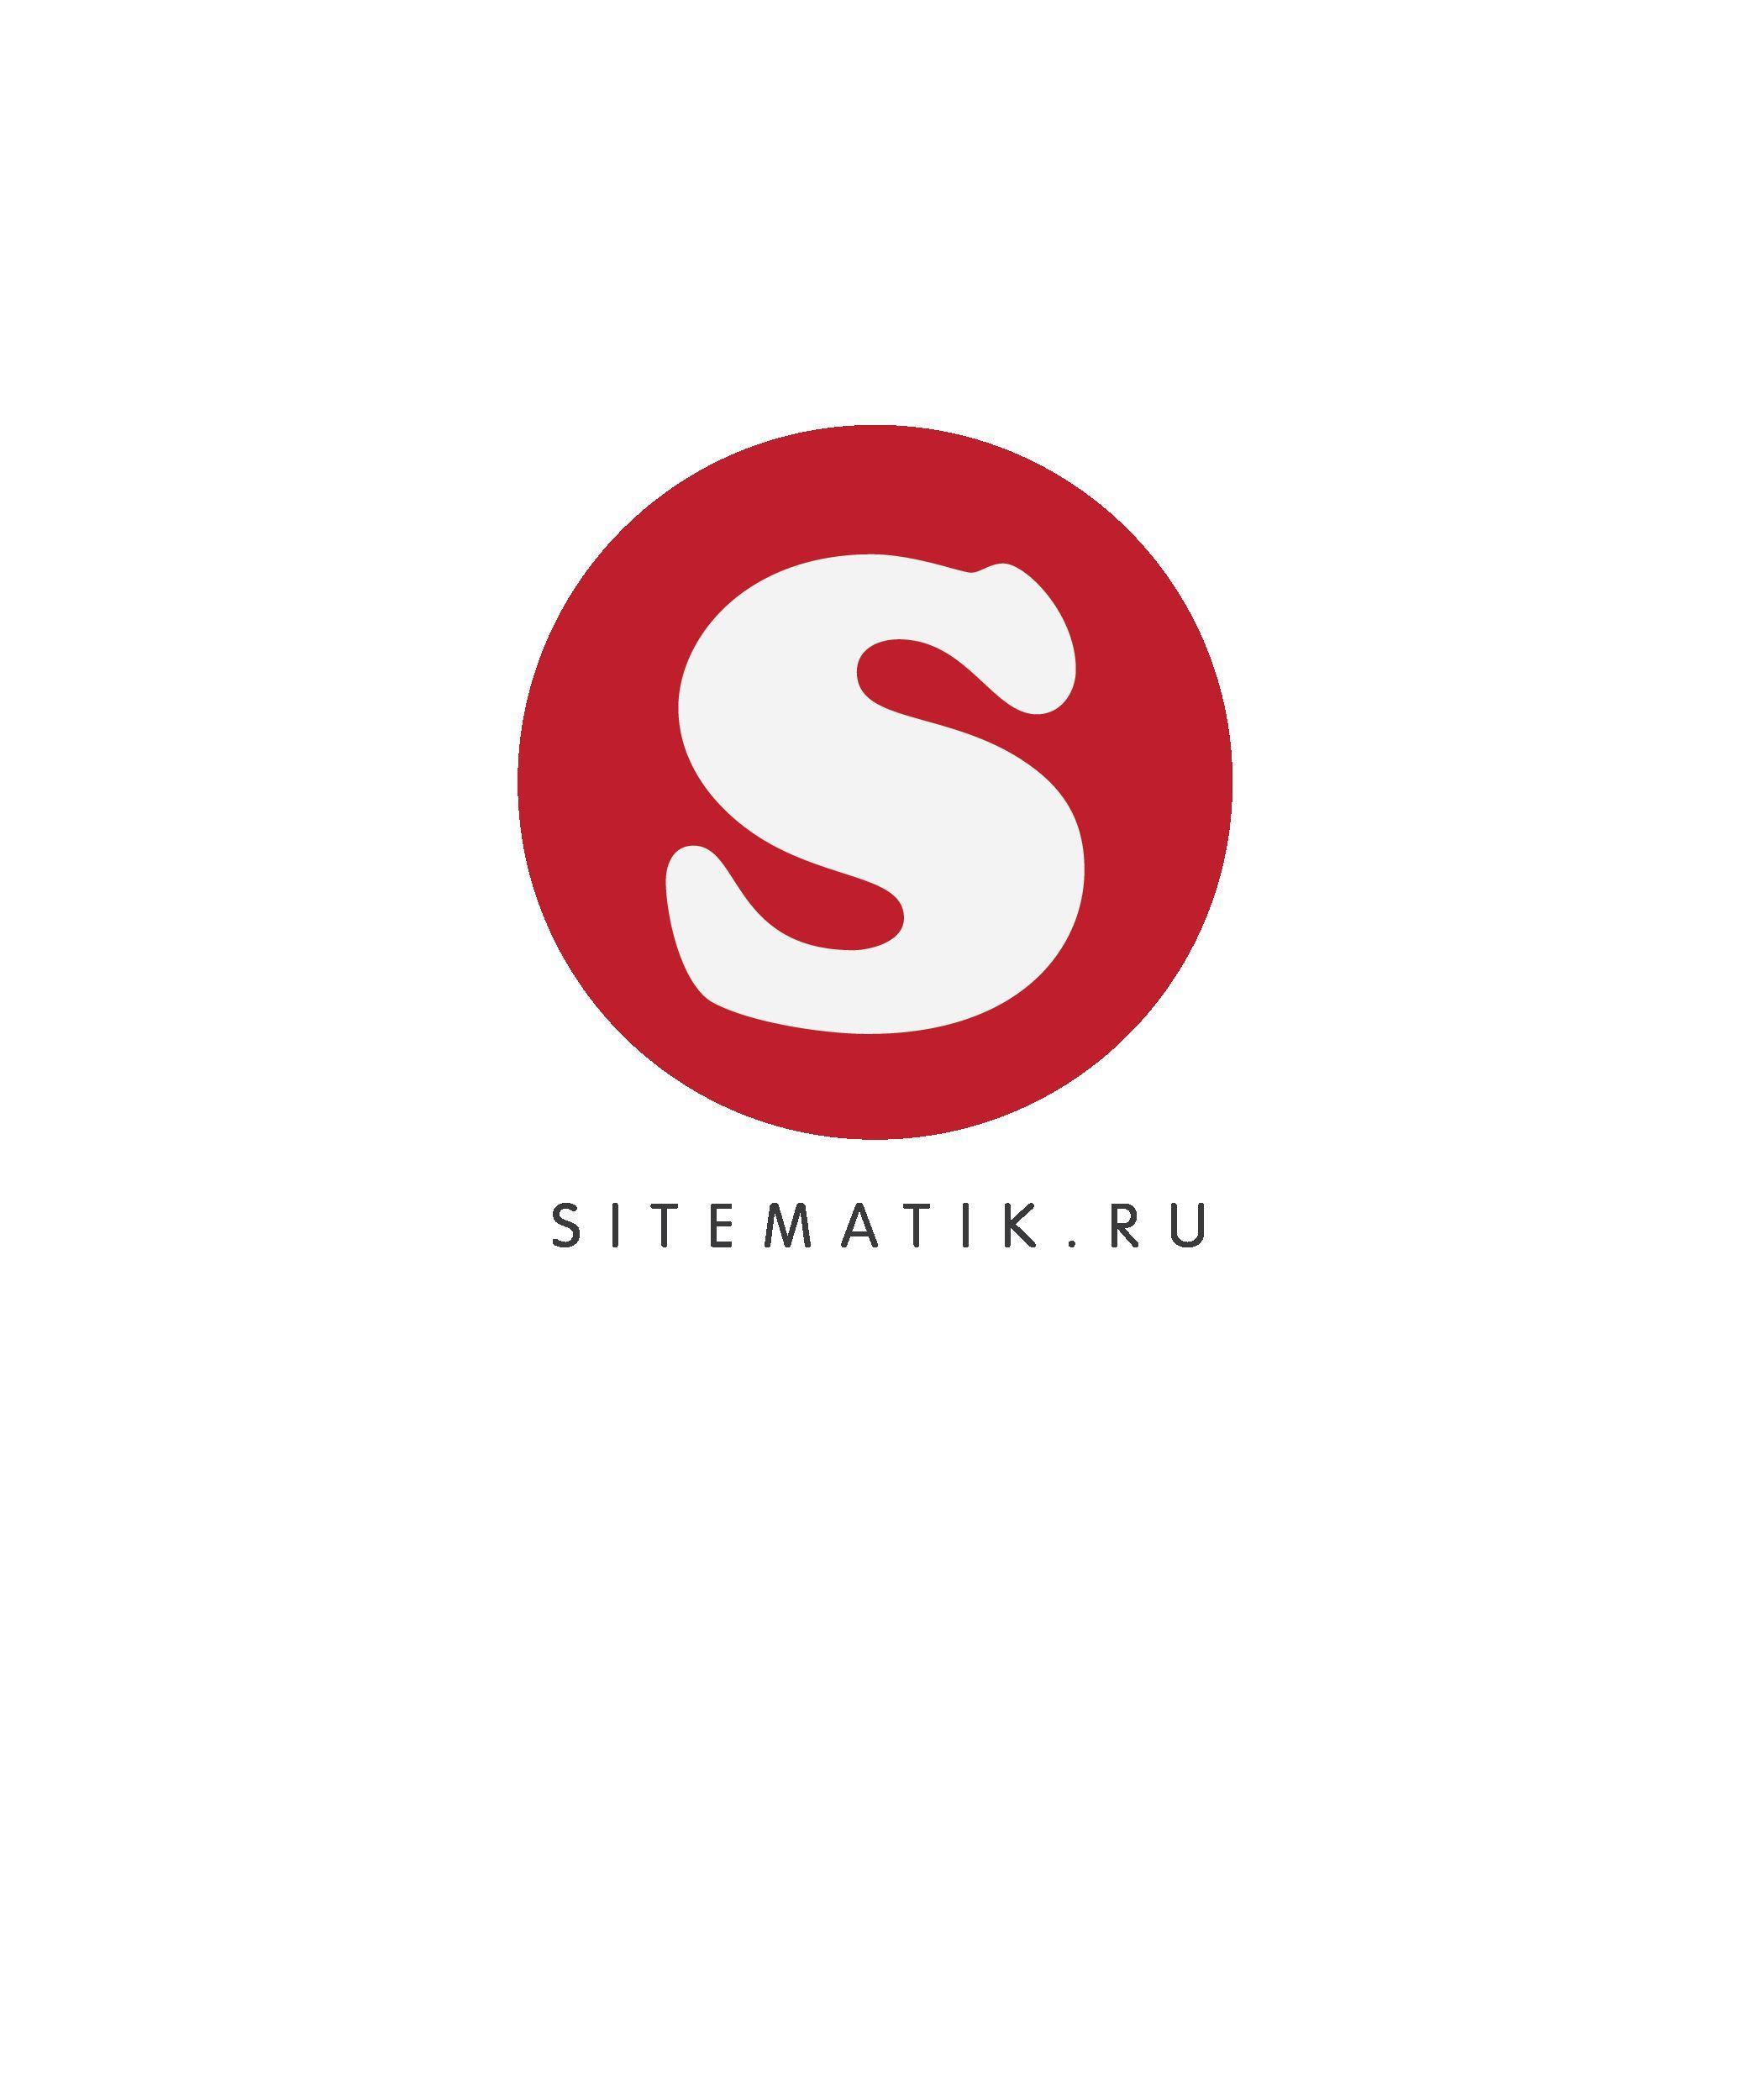 Логотип для Веб-студии - дизайнер Spaiti